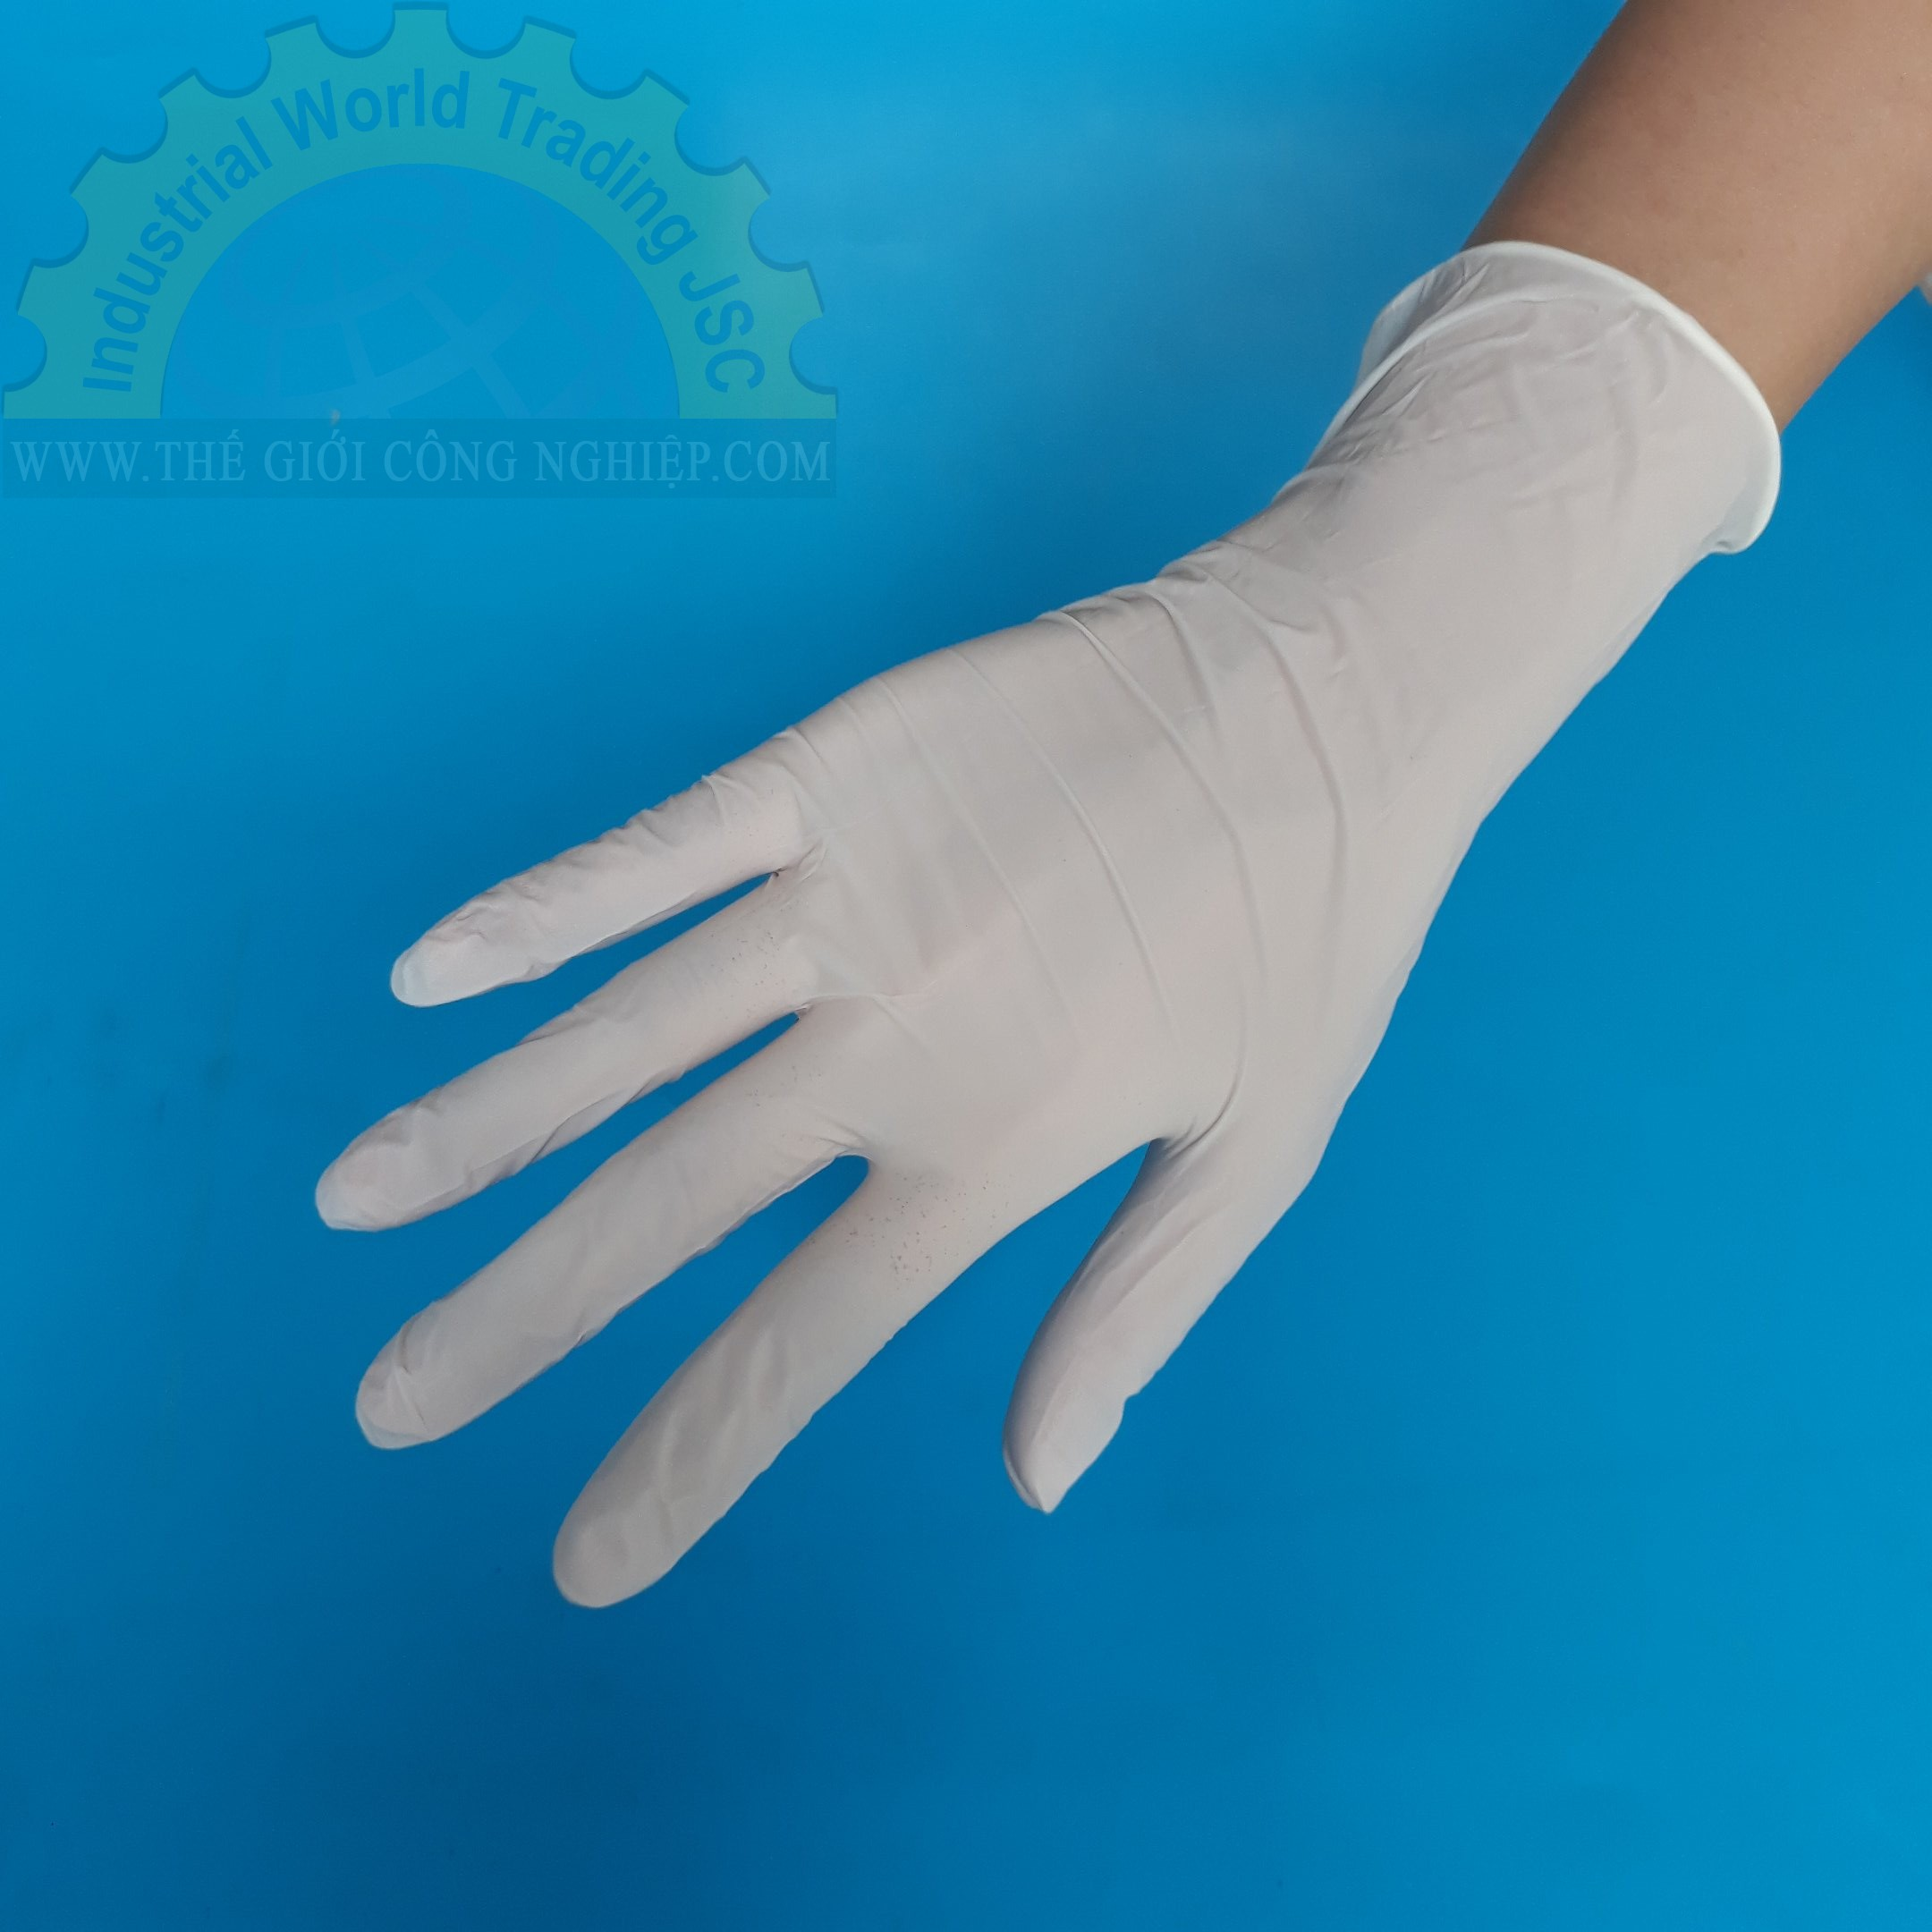 Găng tay nitrile màu trắng size L  TGCN-35905 Vglove